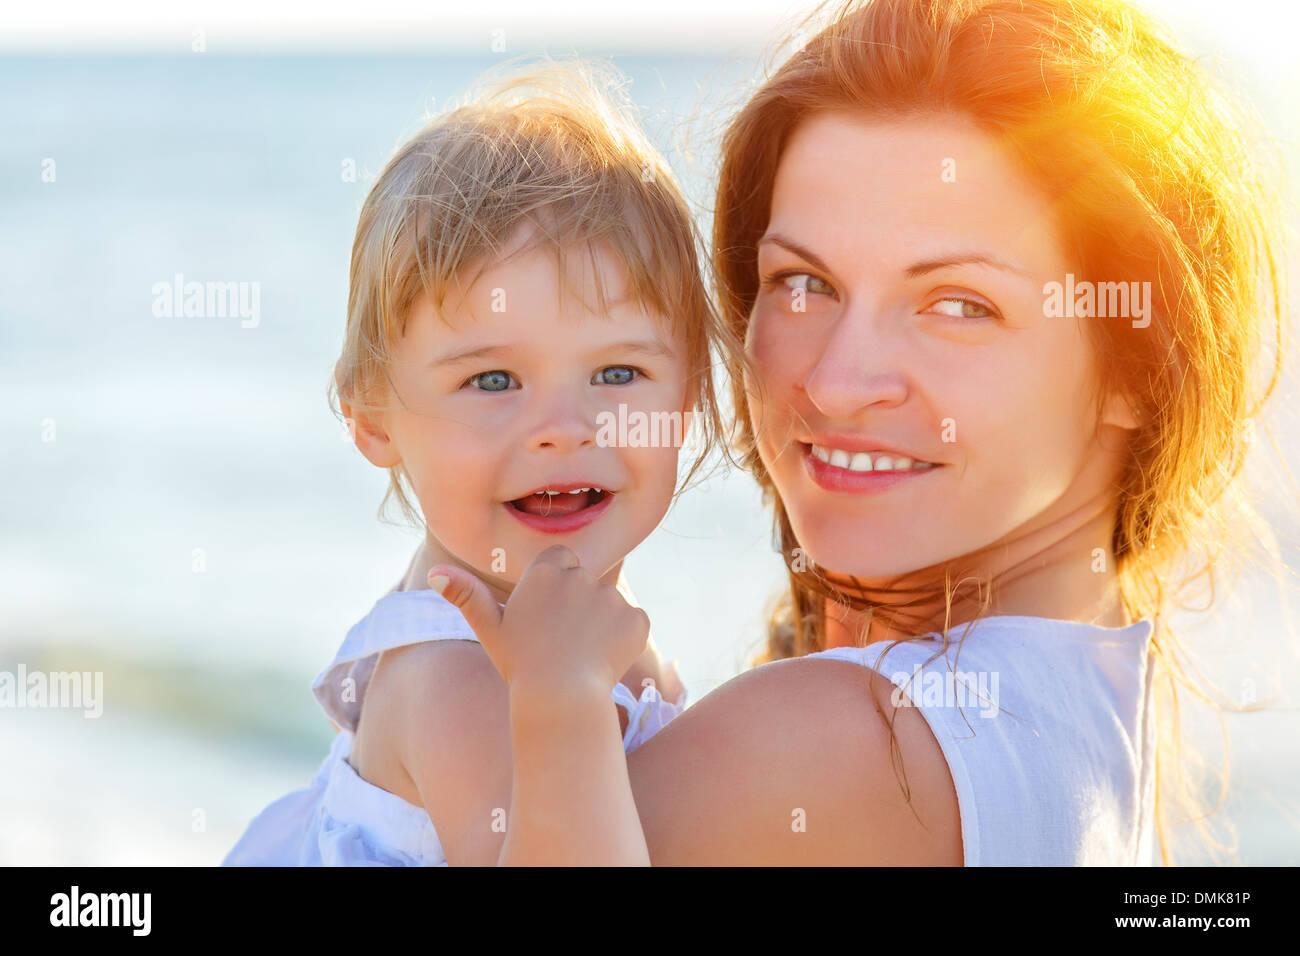 Madre e hija en la playa Imagen De Stock